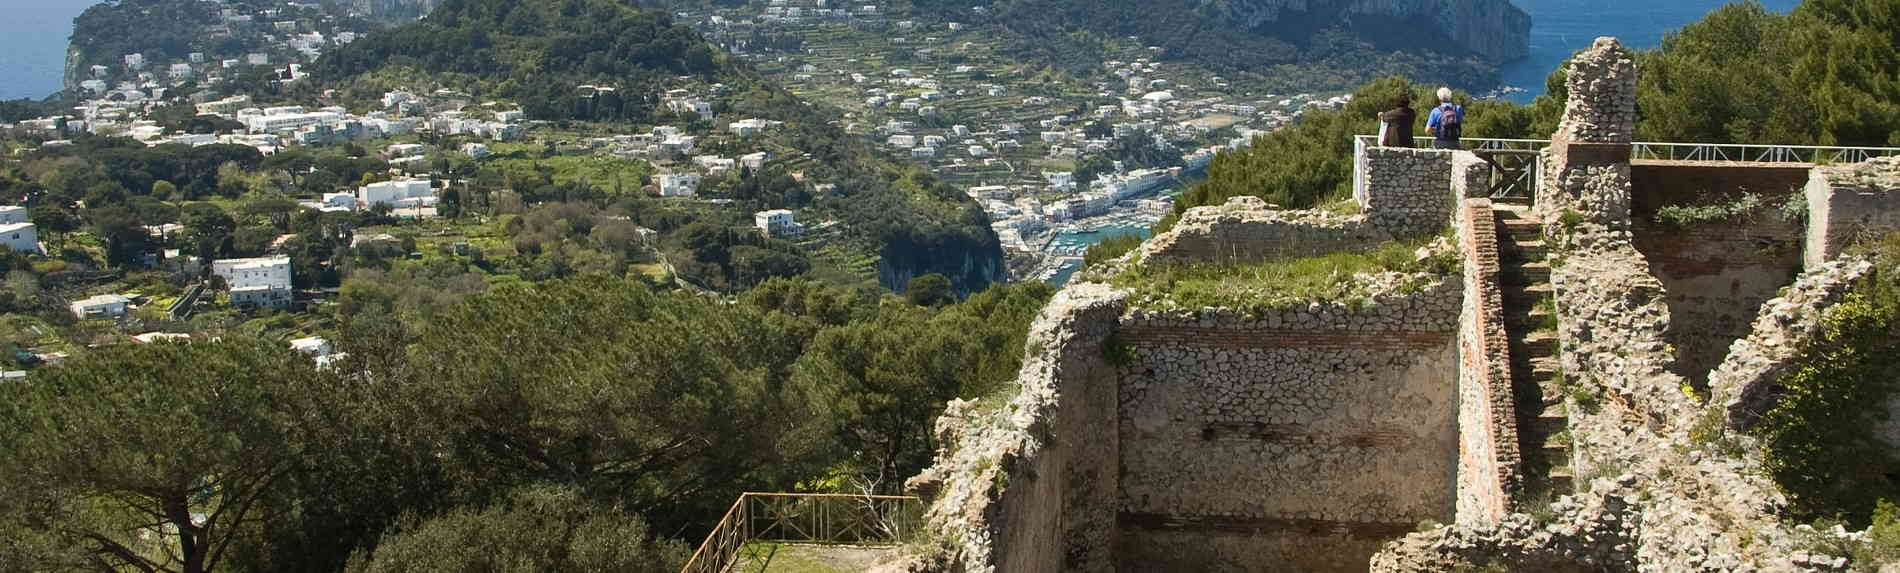 Palace of Emperor Tiberius